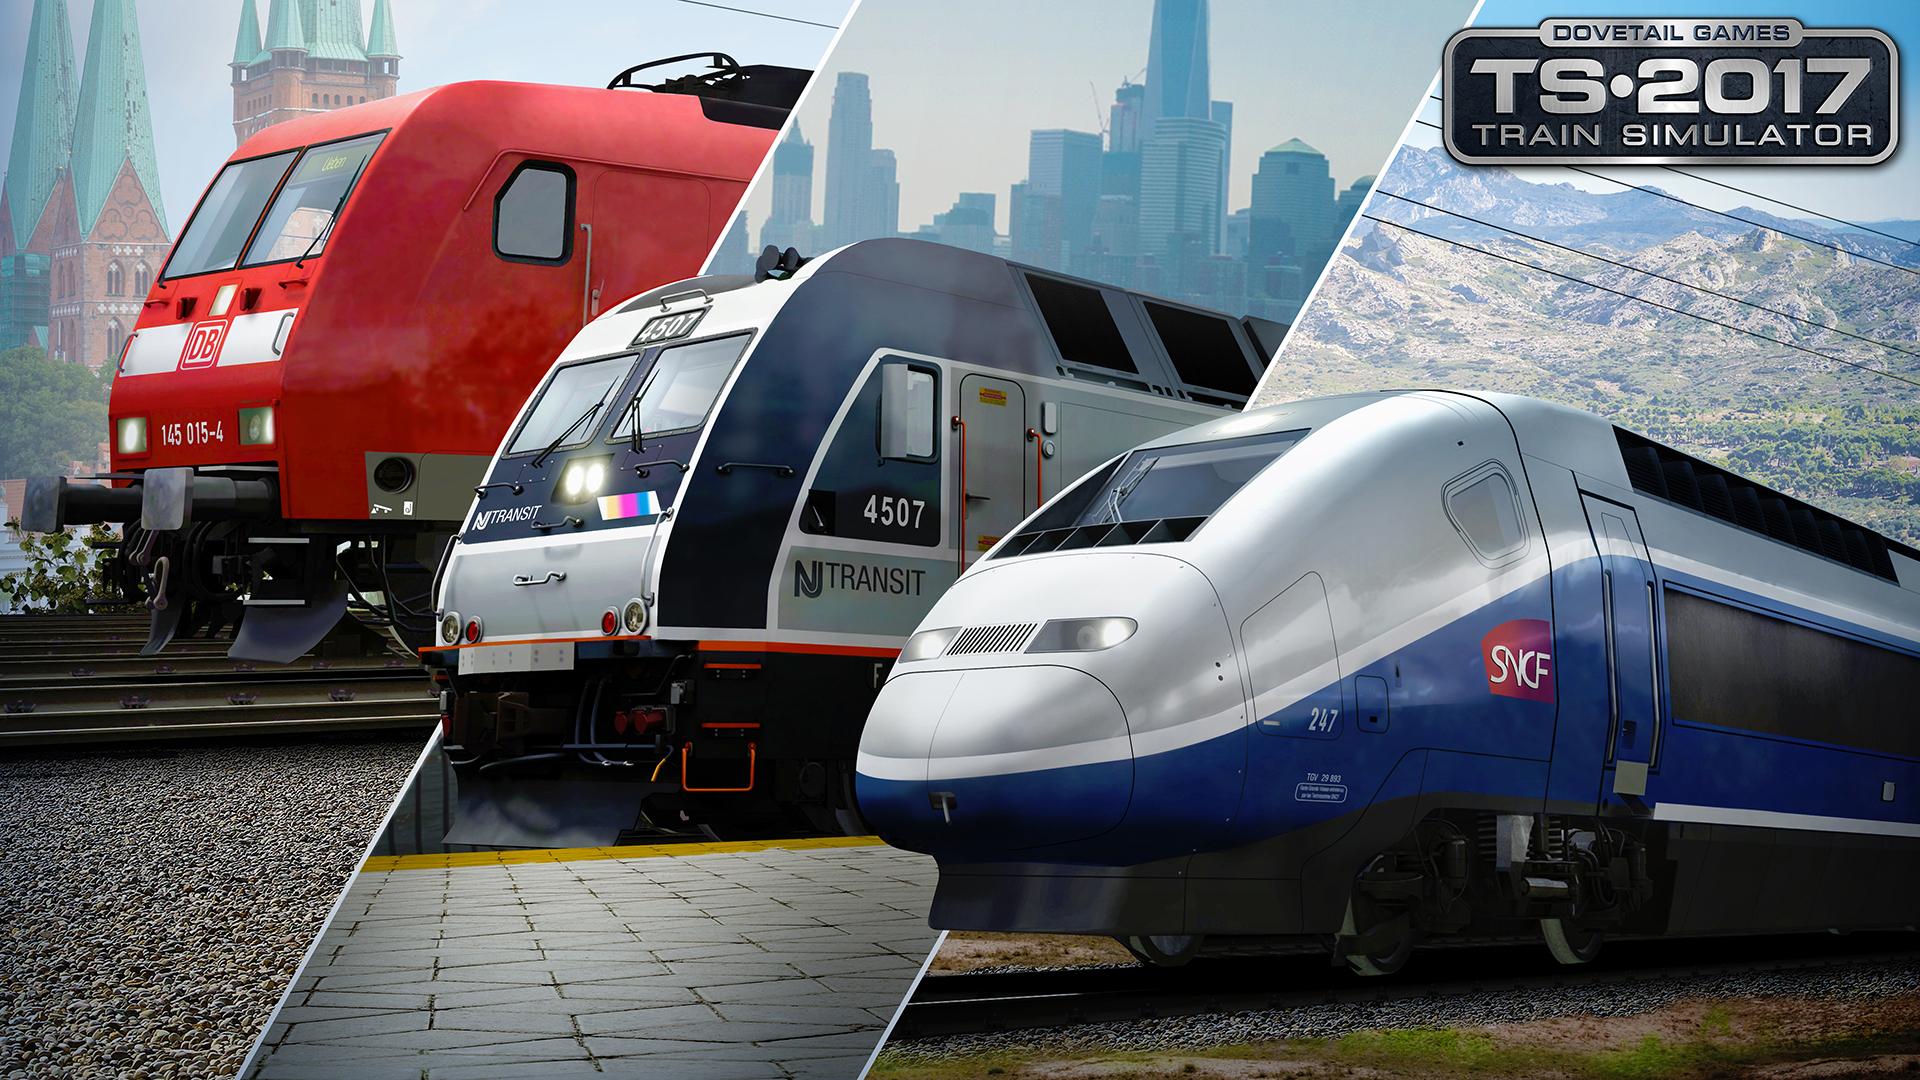 Train Simulator :: Summer Sale 2017: Your Top 10 Add-Ons so far